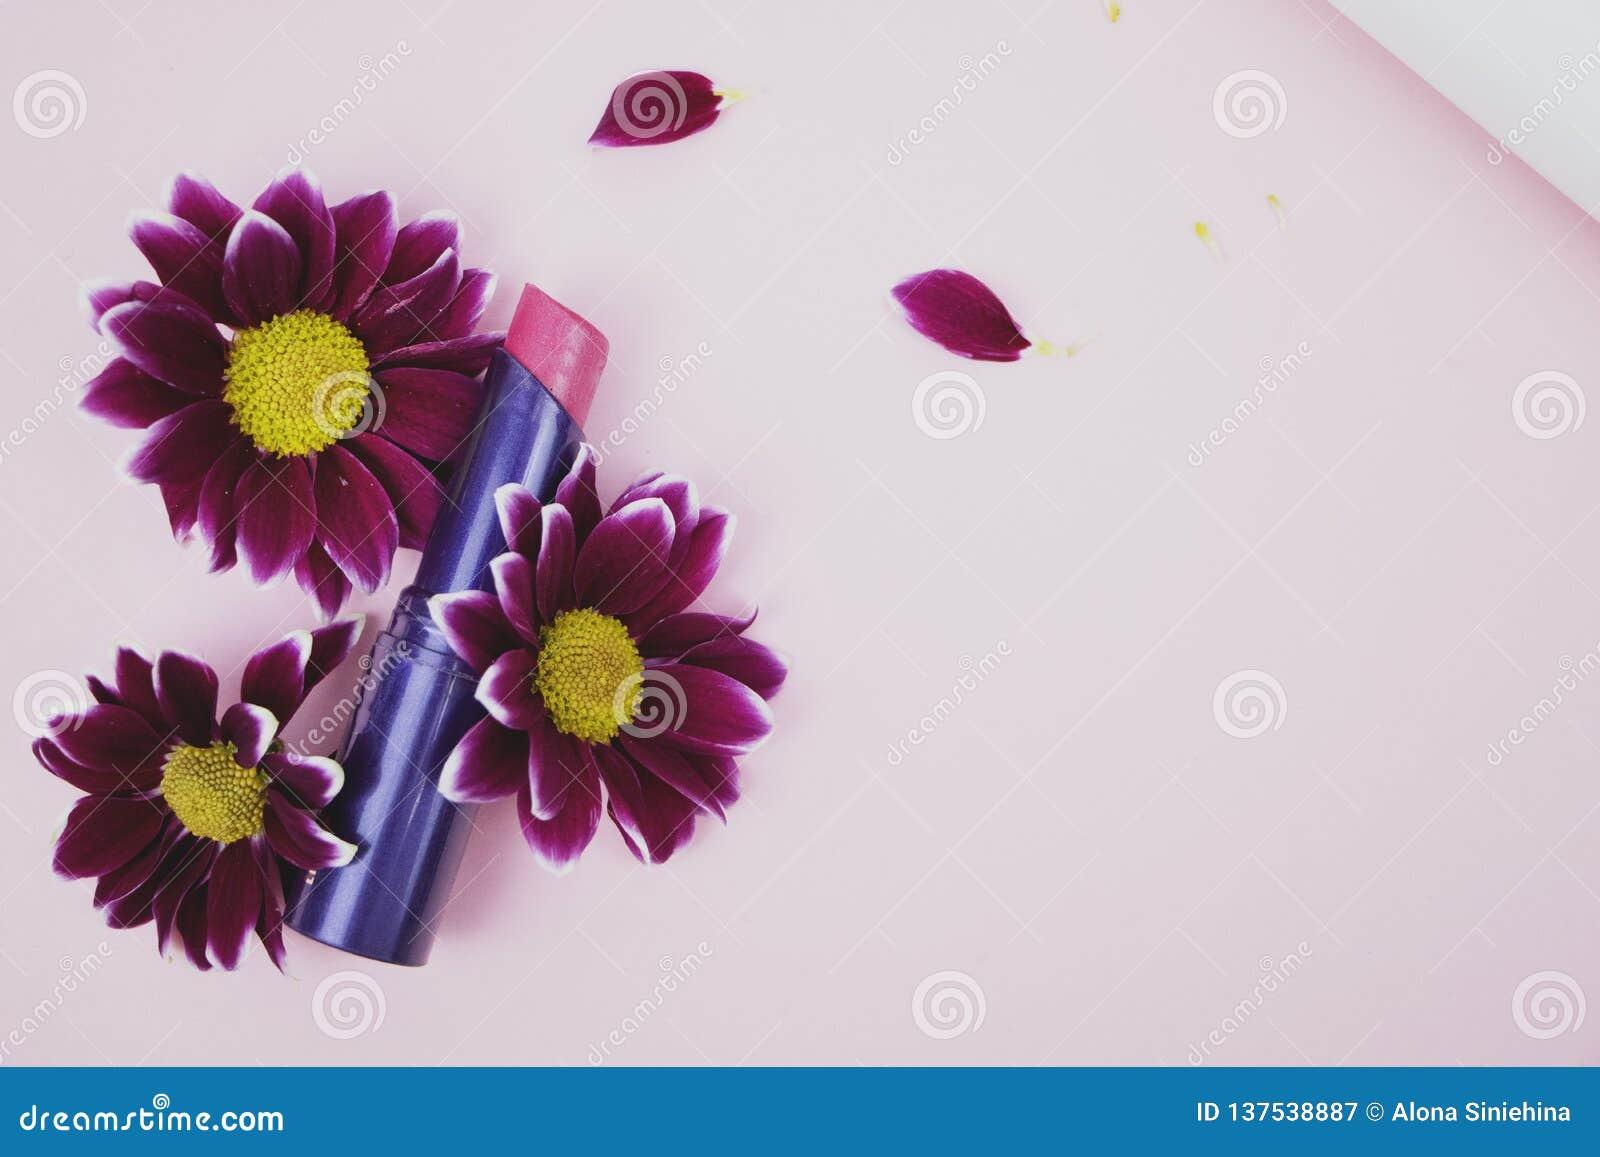 Red Lipstick In Chrysanthemum Flowers Perfume Pink Background